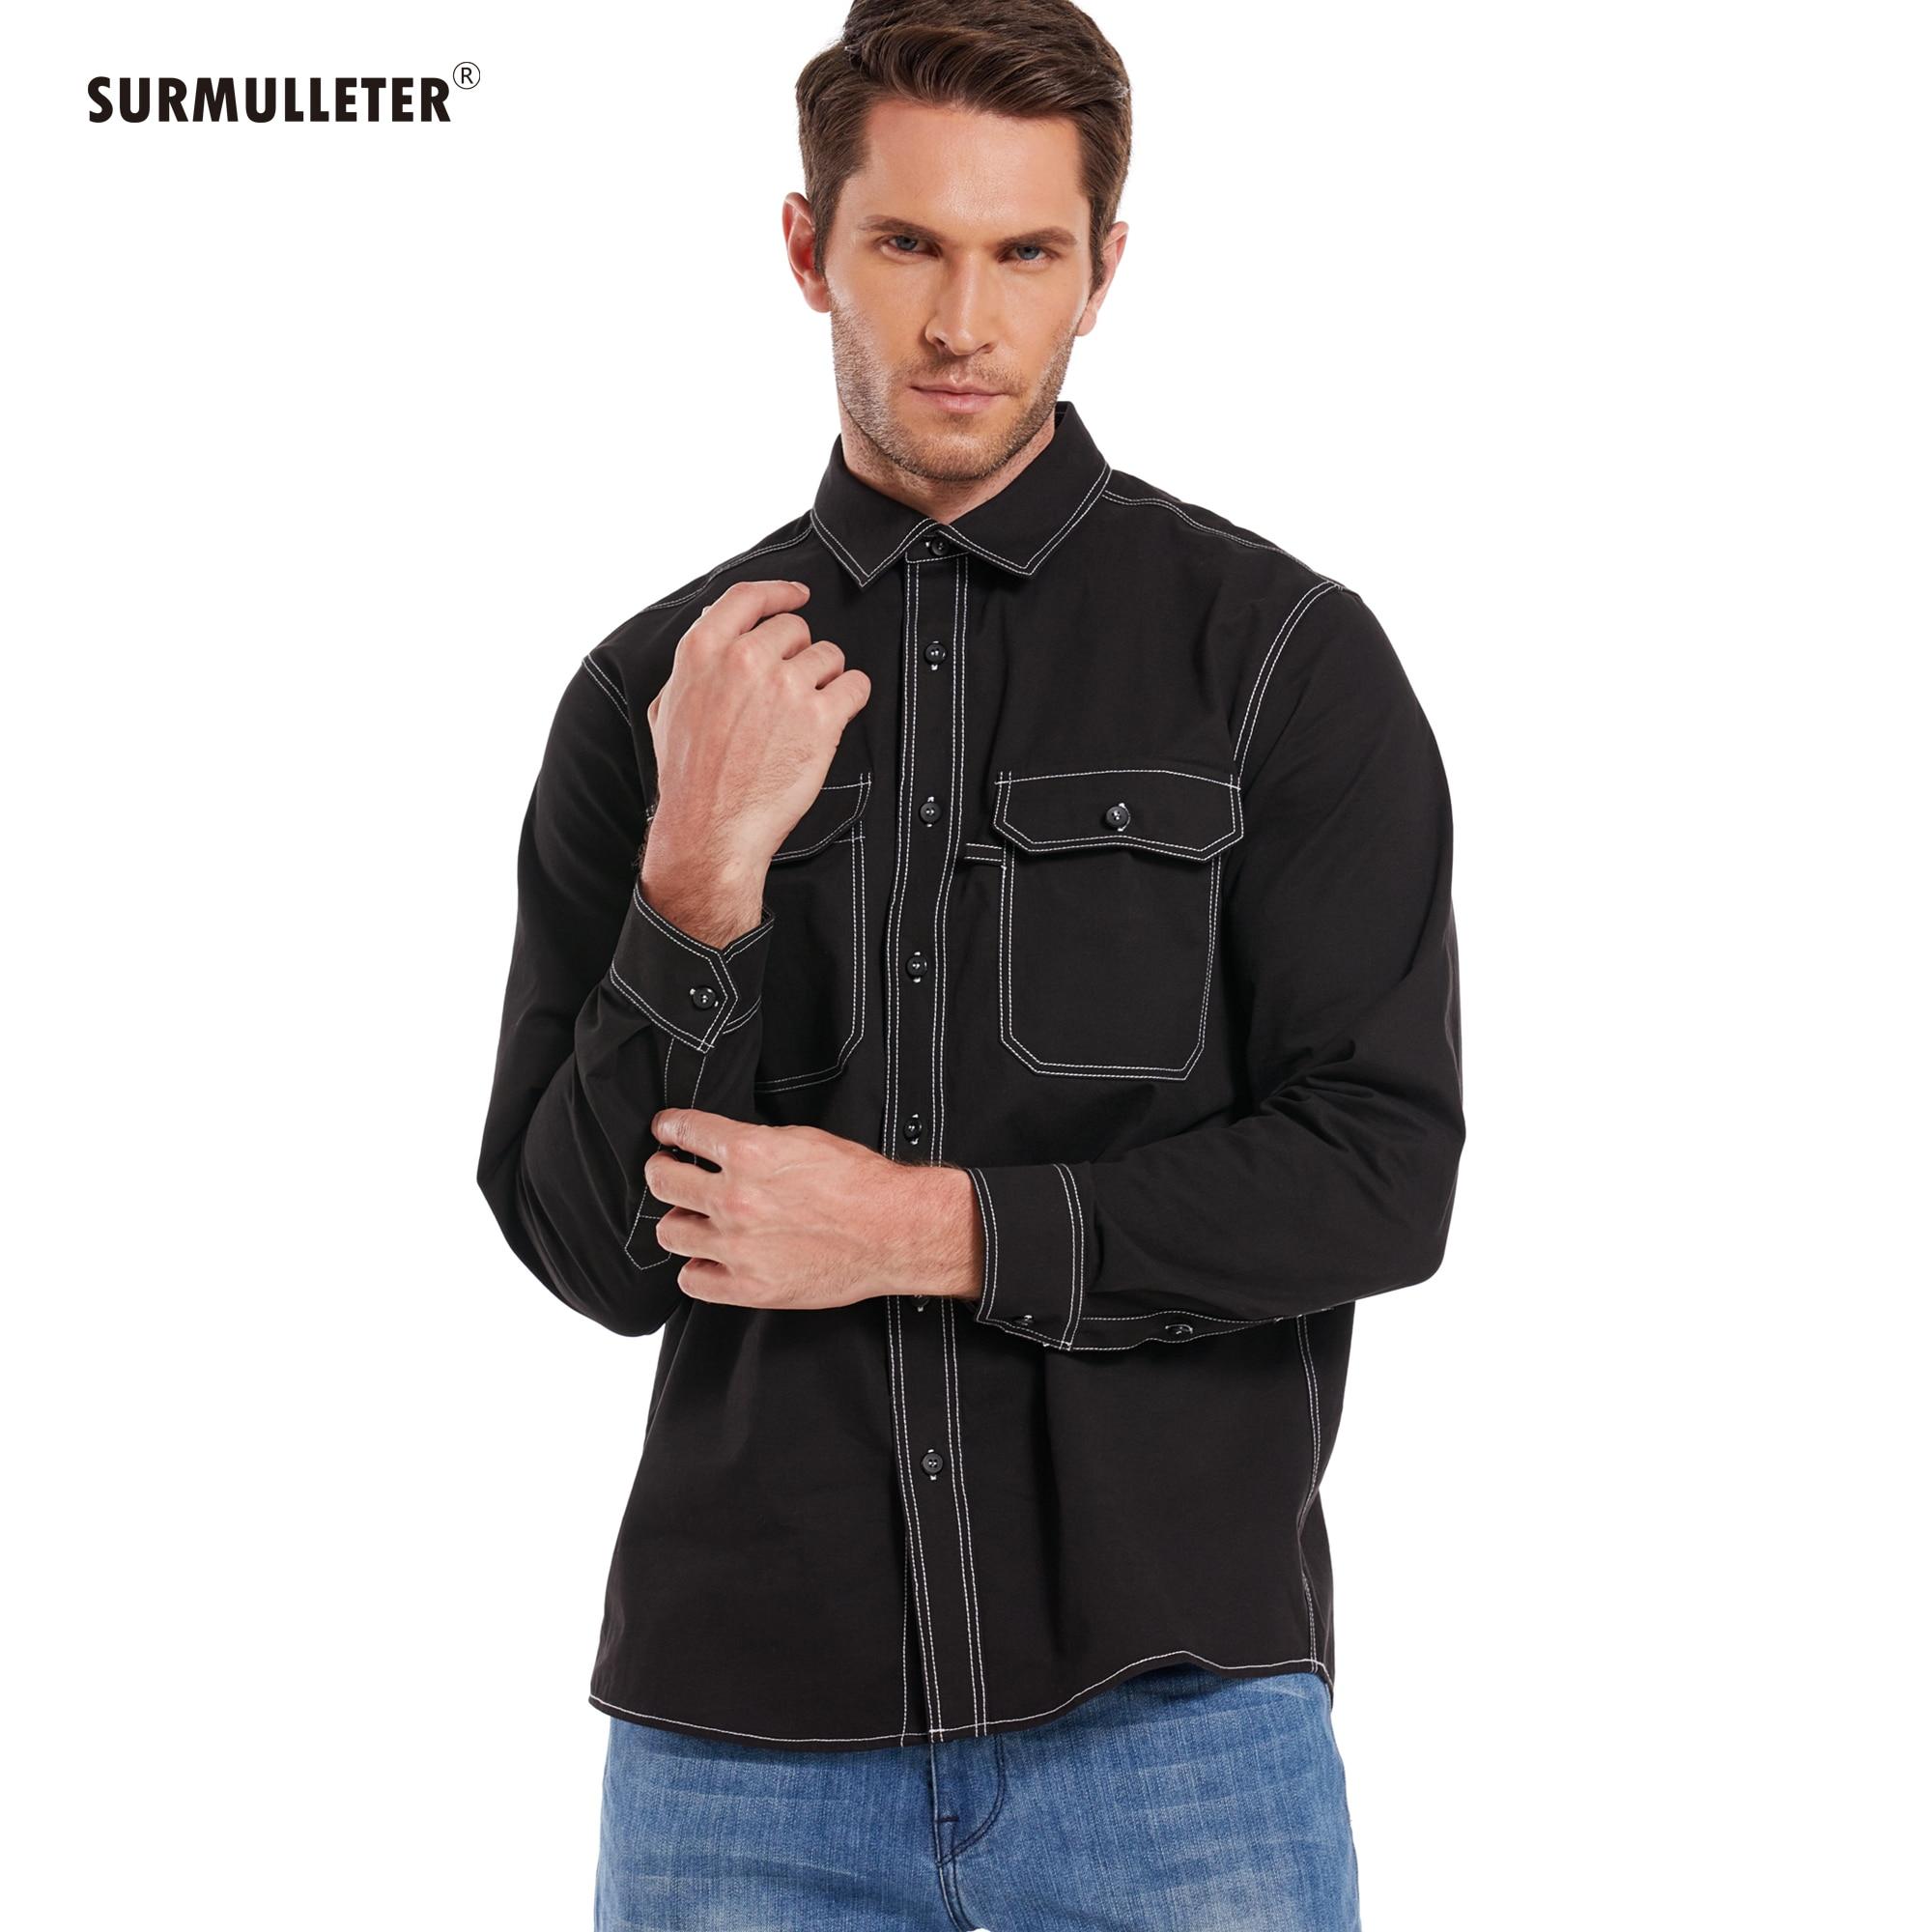 Thickening Type Casual Shirt Men Light  Jacket 100%Cotton Long Sleeve safari Style New Brand SURMULLETER